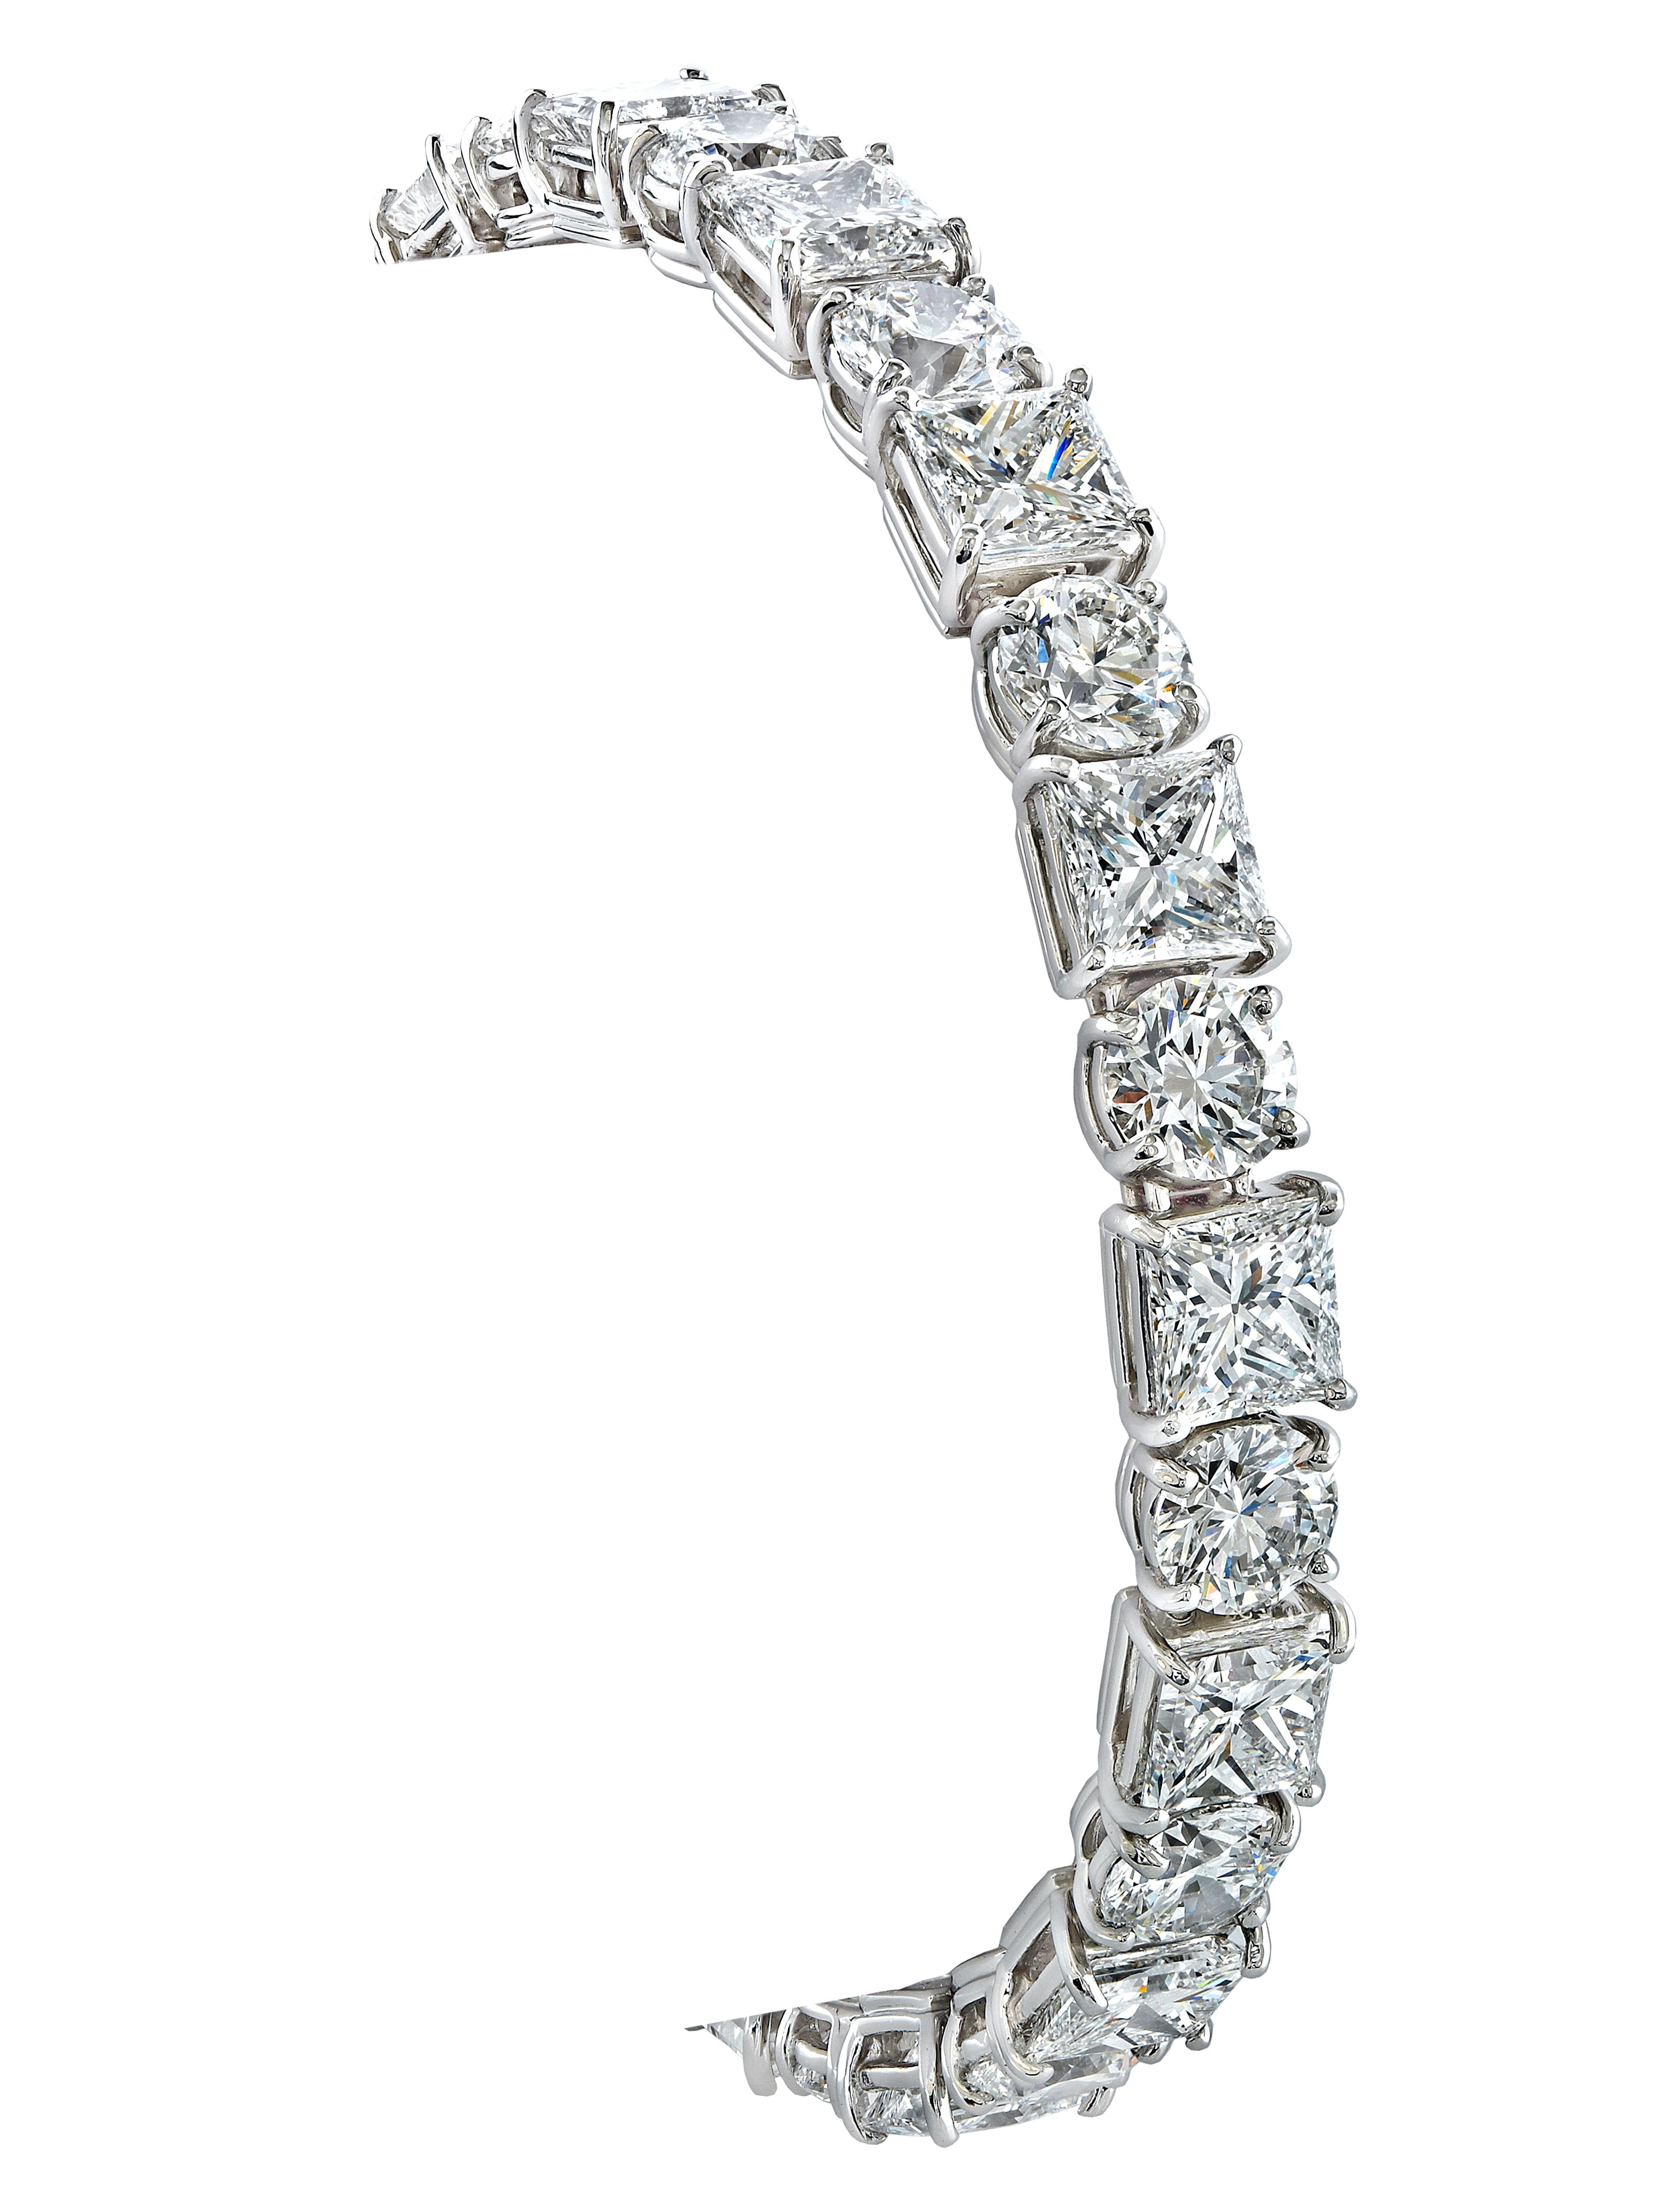 Gordon James Diamond Tennis Bracelet featuring Round Brilliant